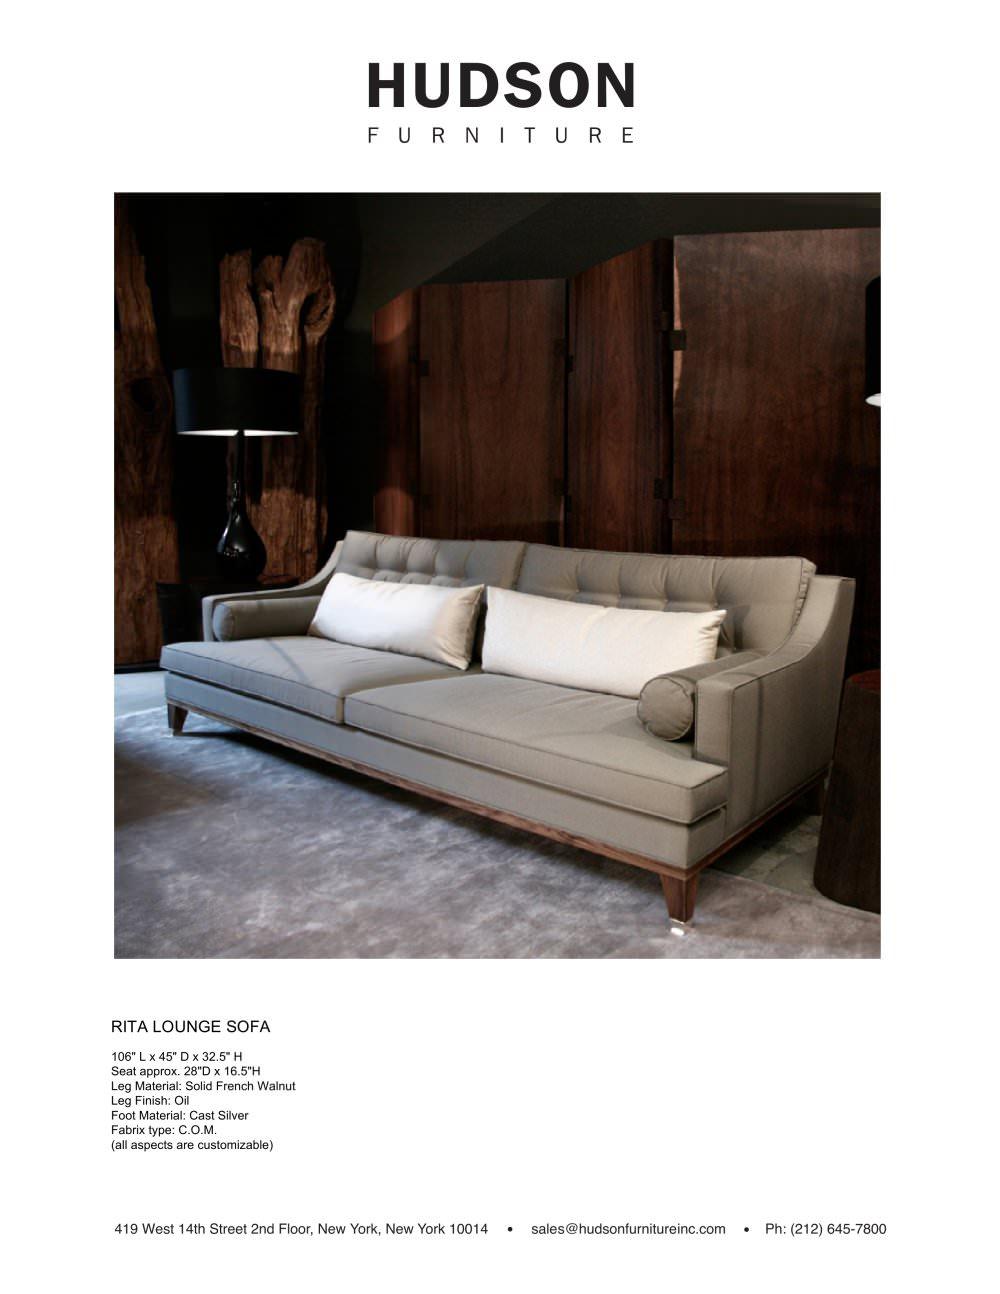 UPHOLSTERED:RITA LOUNGE SOFA - Hudson Furniture - PDF Catalogues